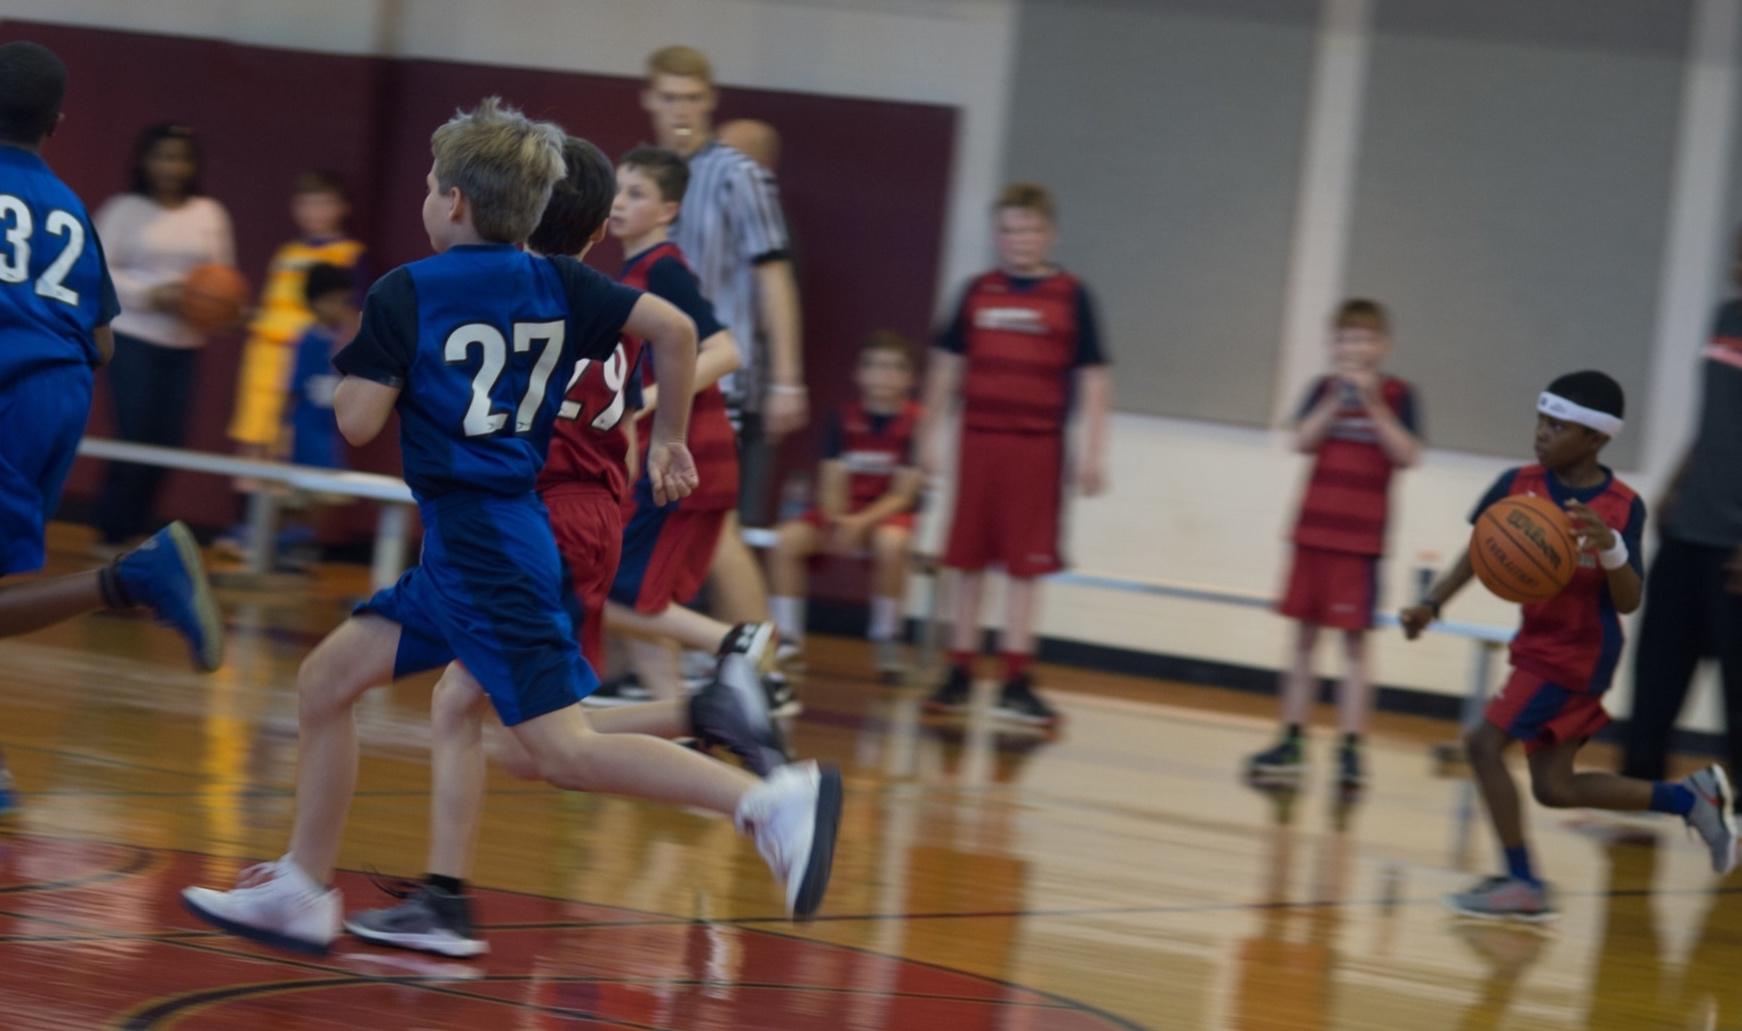 basketballandGREETERPIX-10.jpg